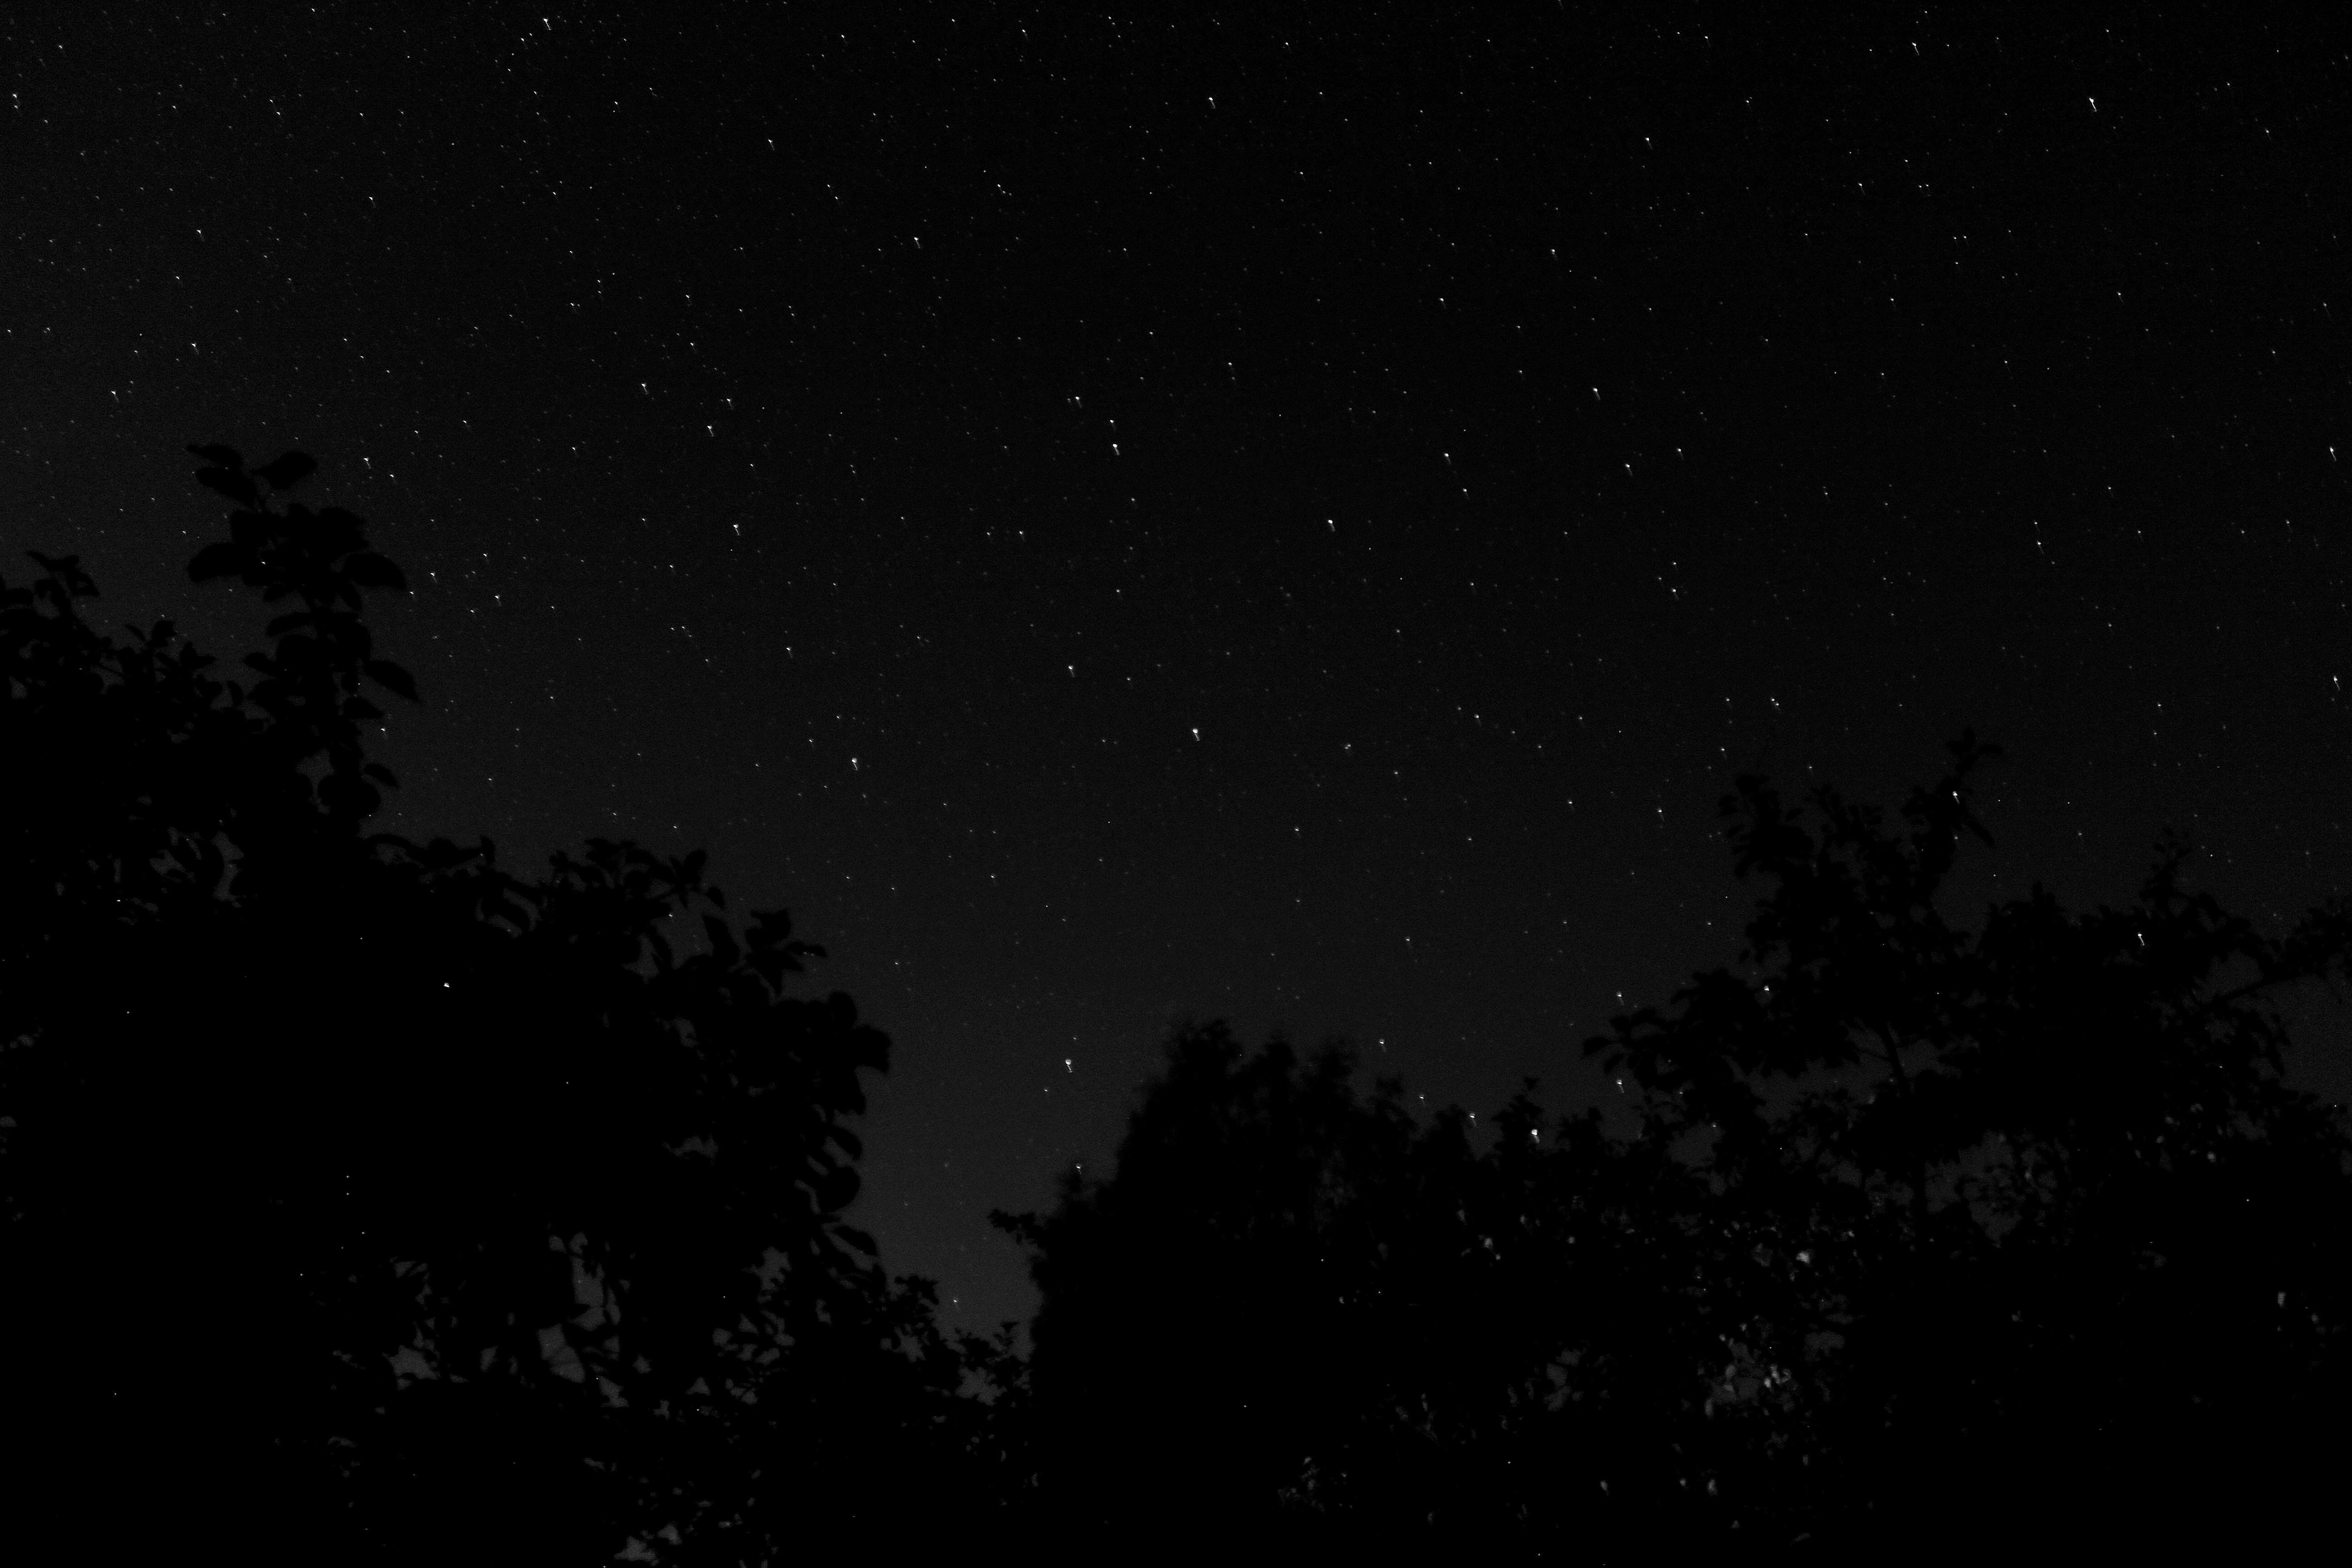 black starfield